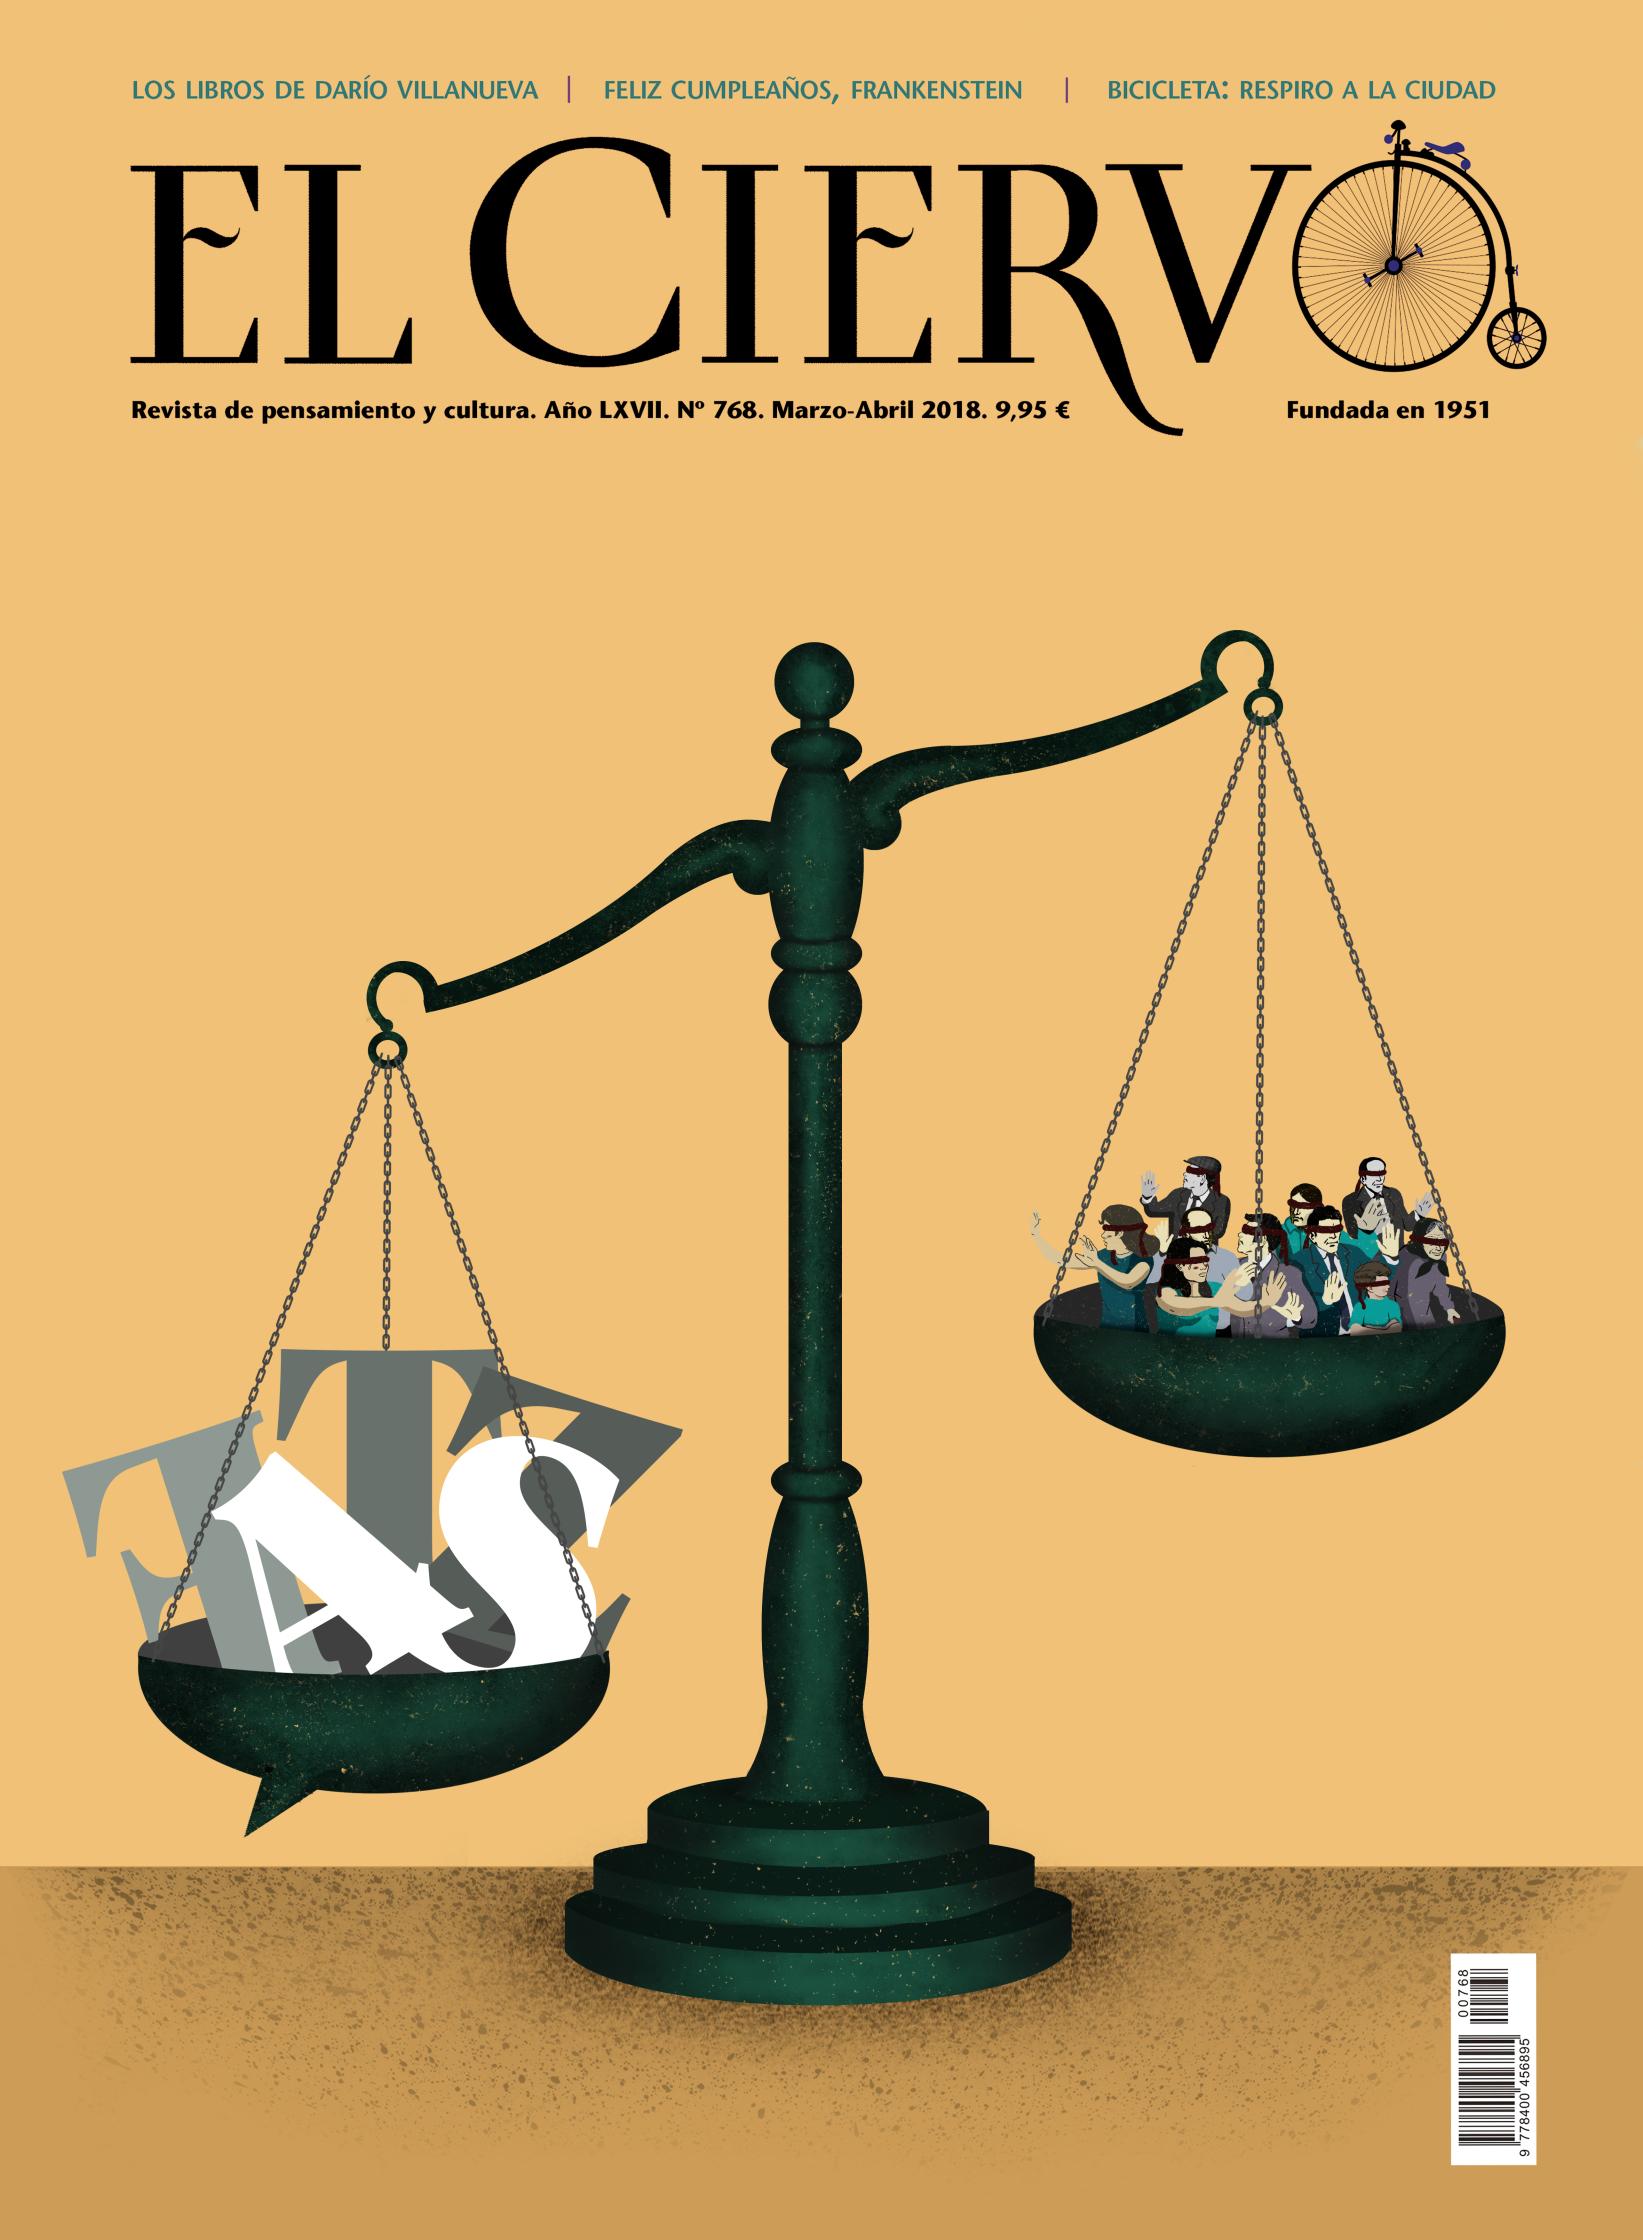 El Ciervo cover - The power of the word.jpg